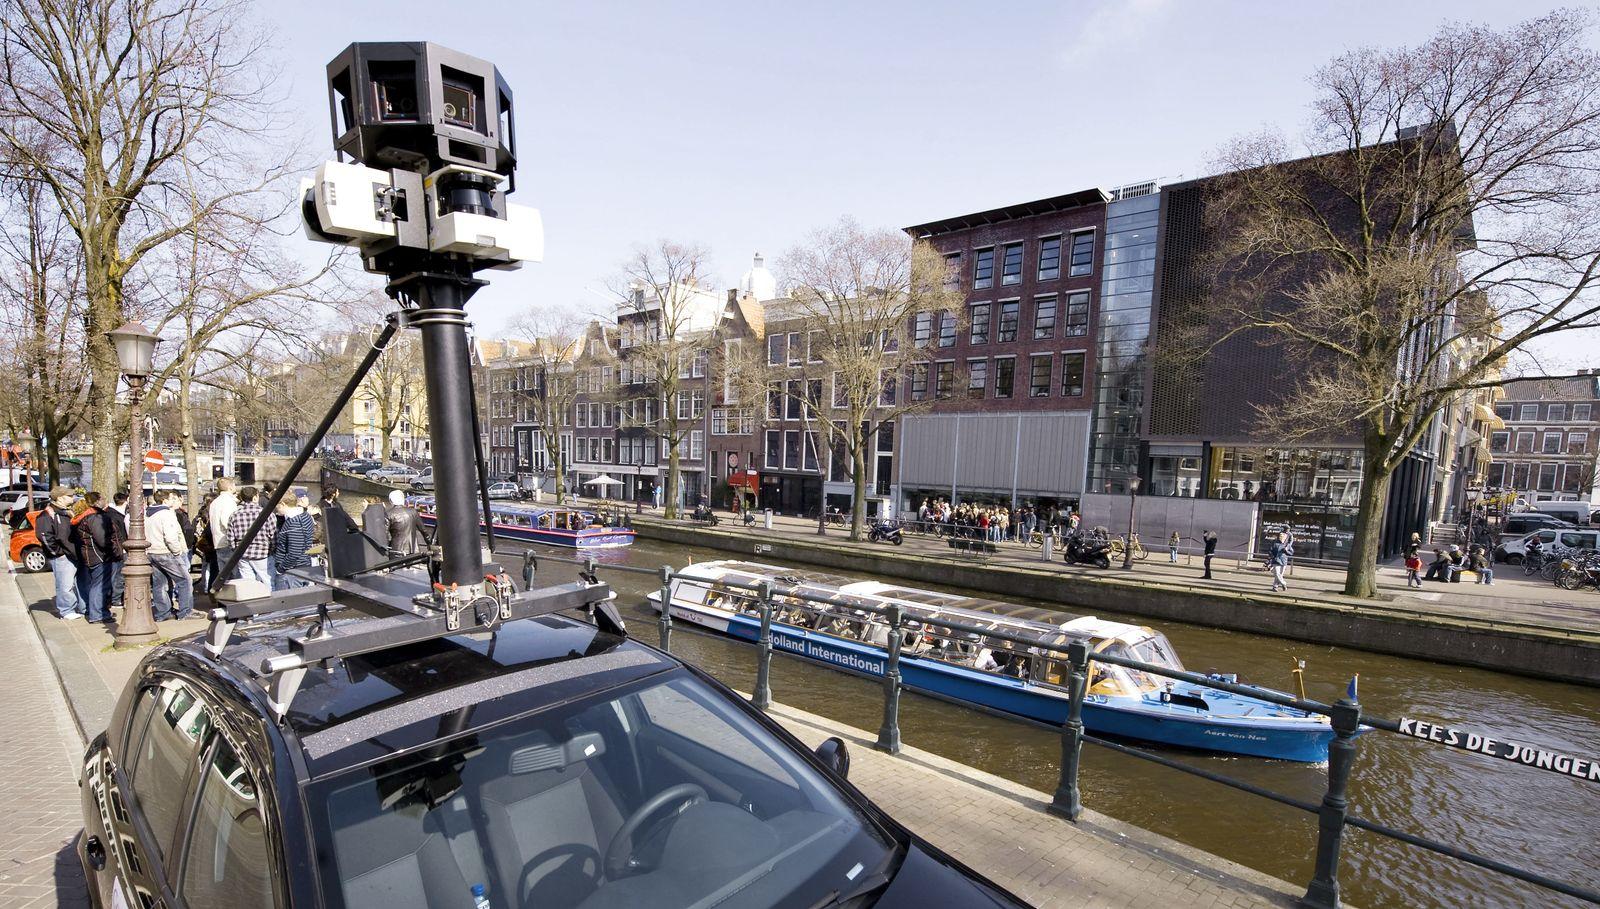 NETHERLANDS-GOOGLE-STREET VIEW